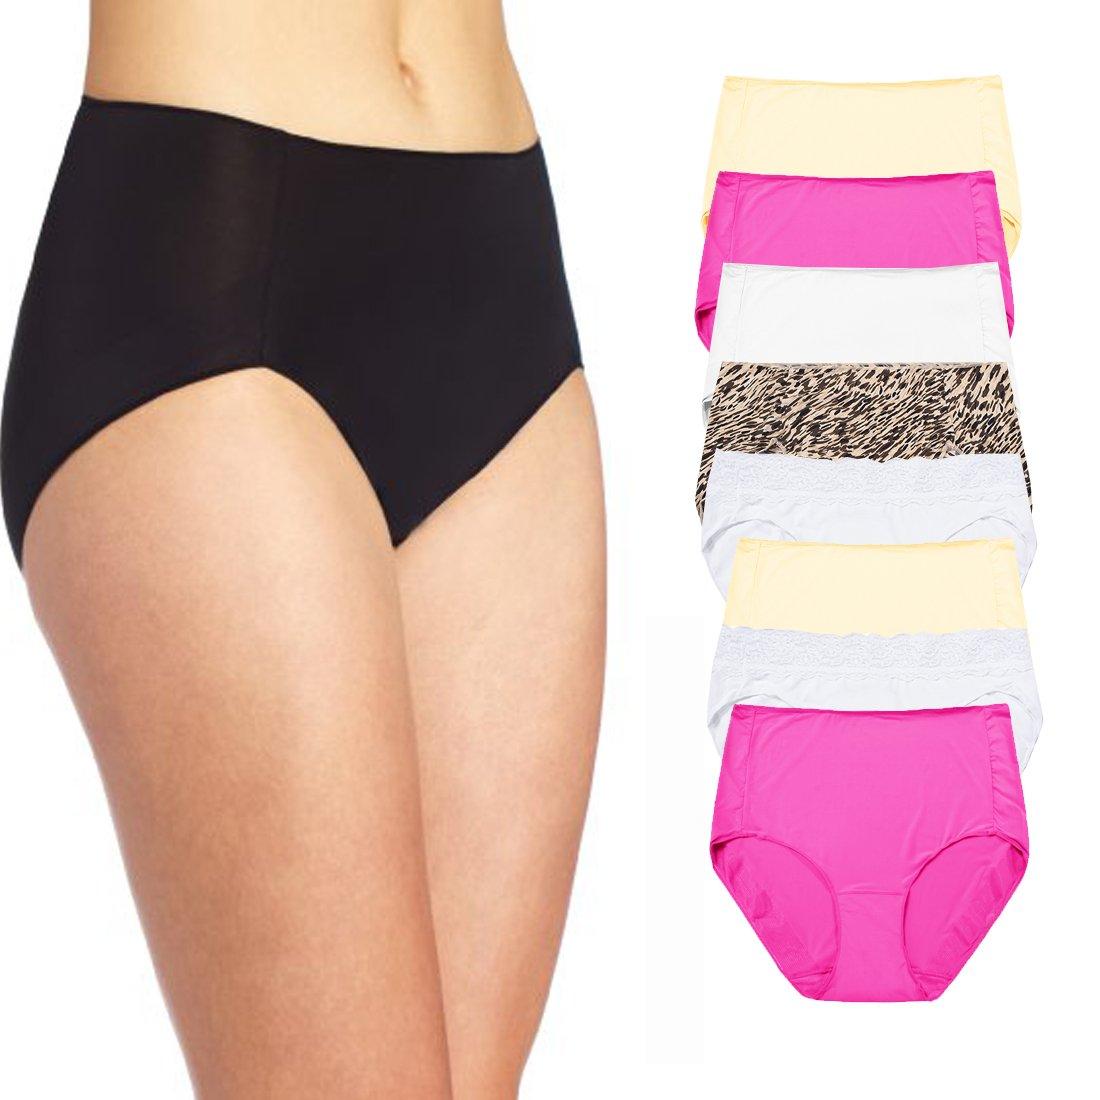 Mixed Designer Brands Bulk Savings Pack - 8 Womens Panties Underwear    Briefs M 6 Multicolor at Amazon Women s Clothing store  611bbc2dfe